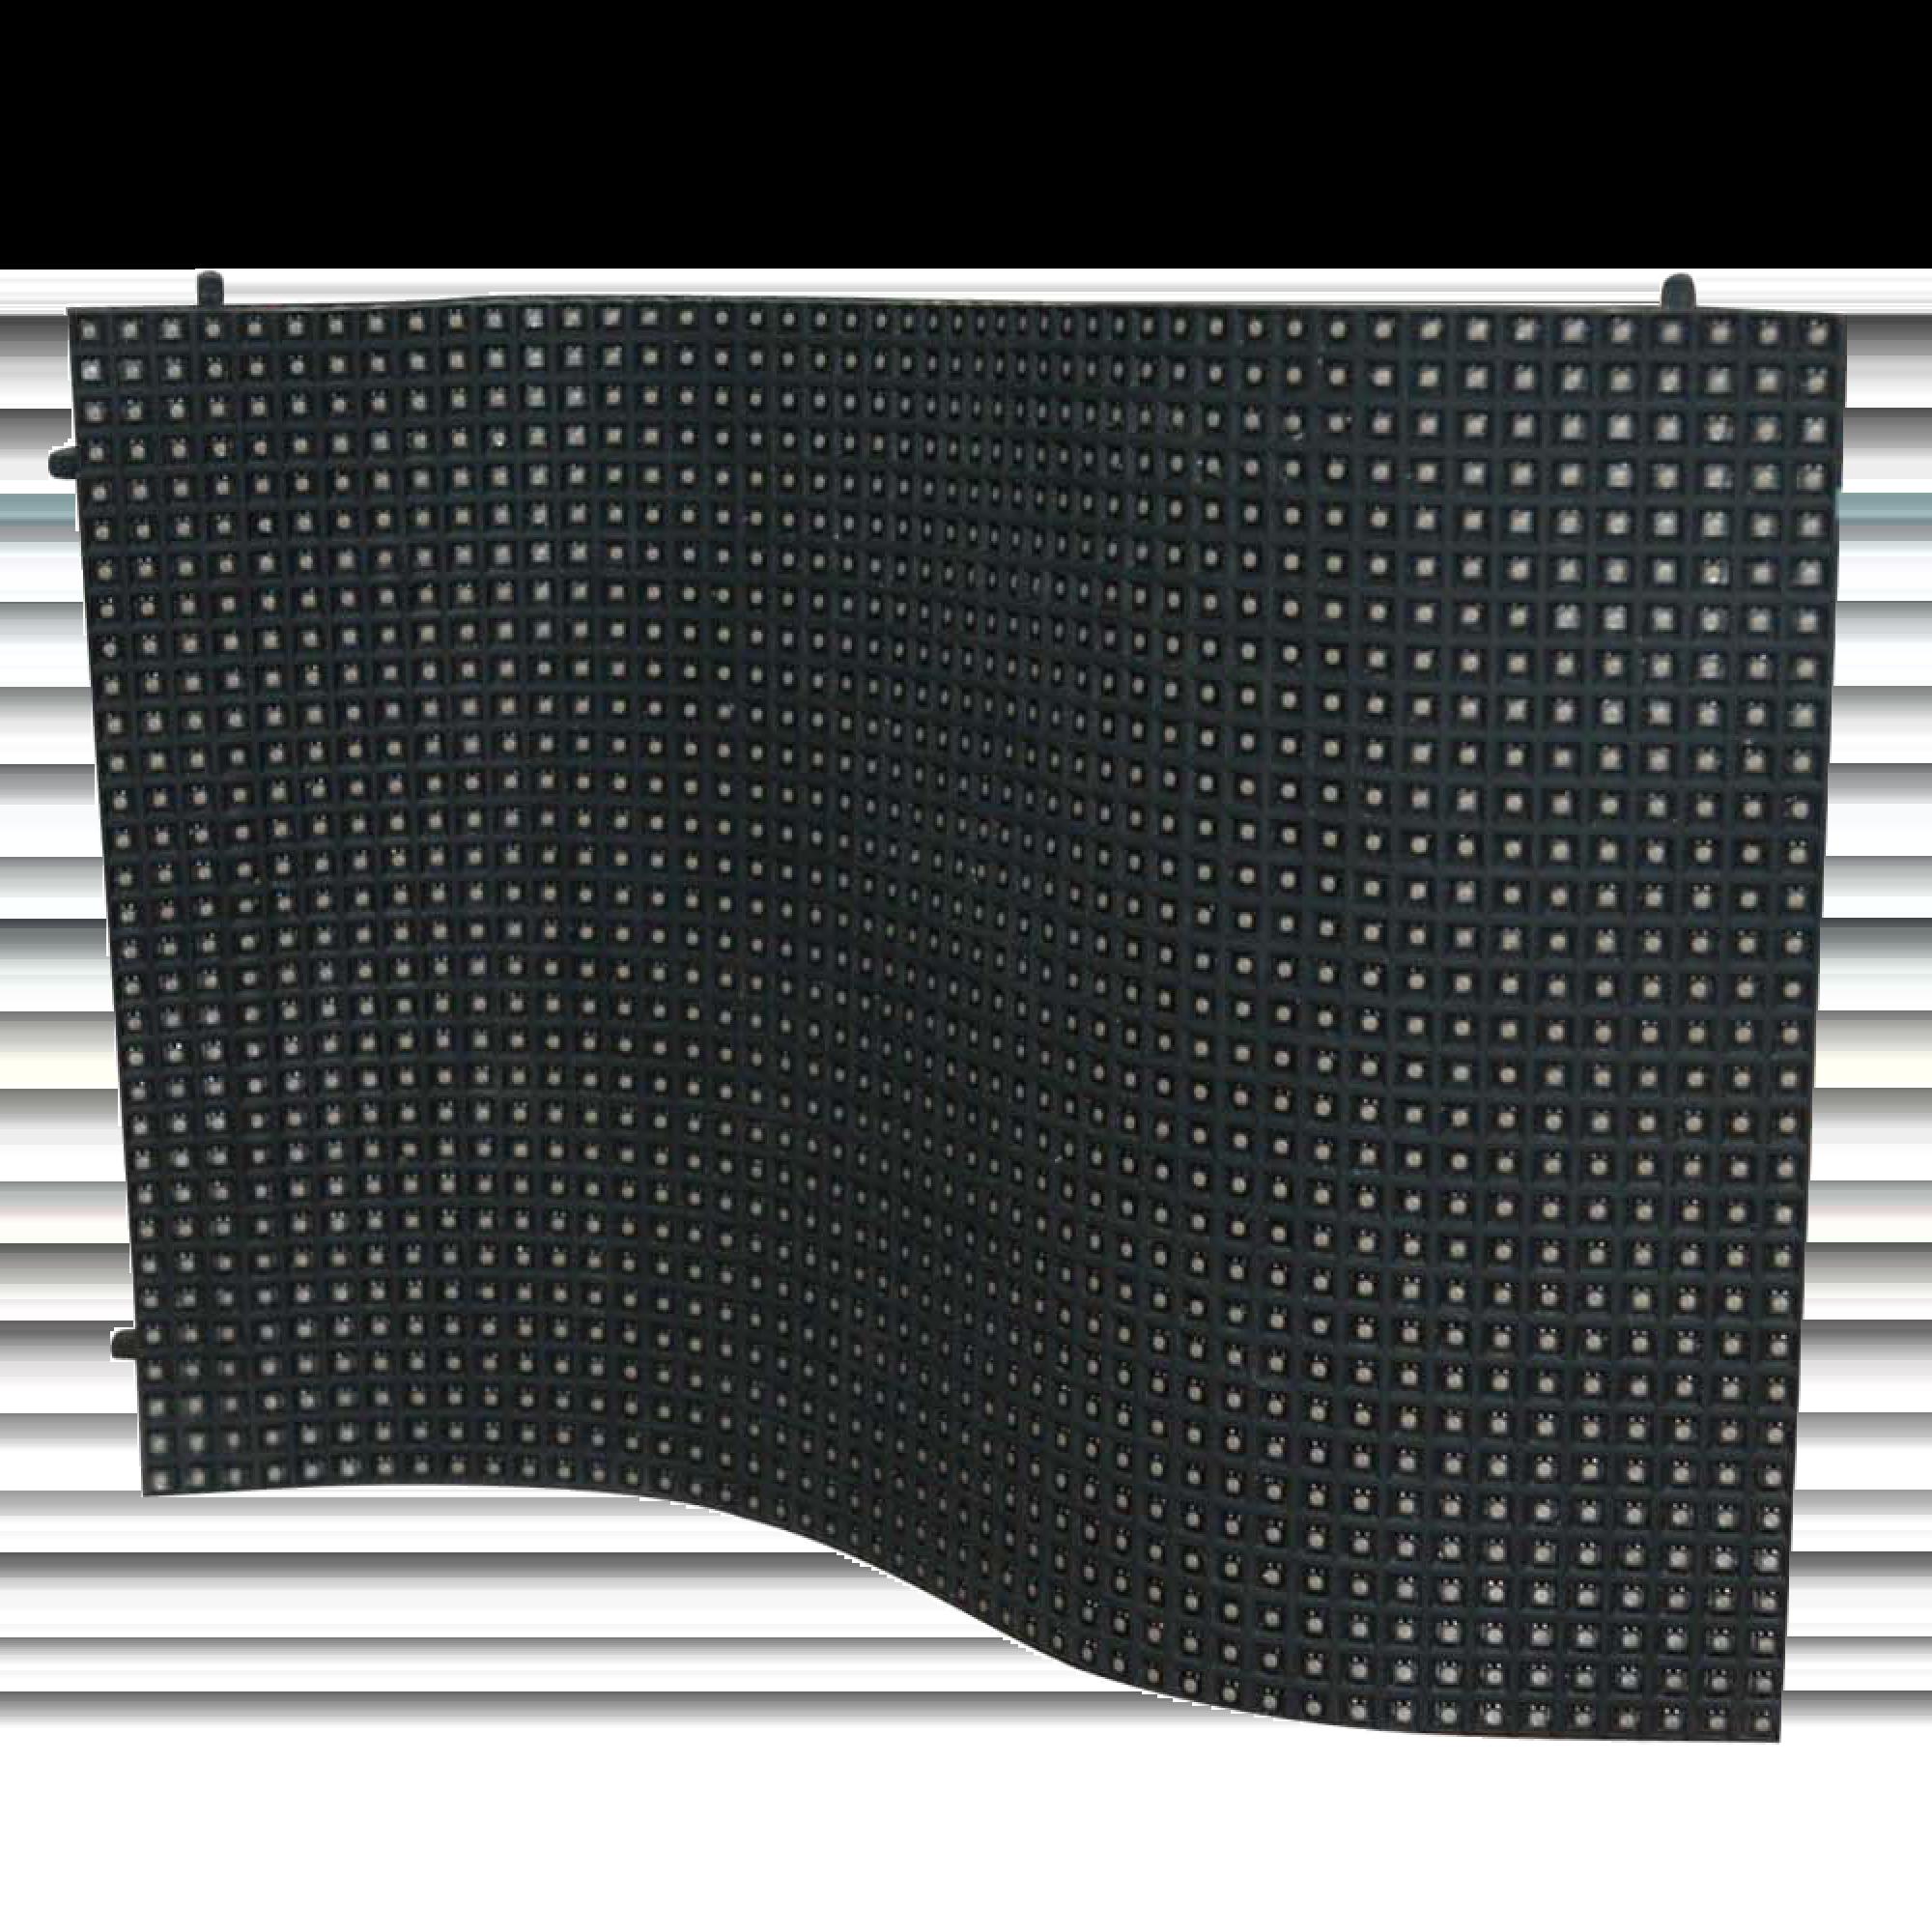 flexible rectangular LED ribbon display with fine pixel quality